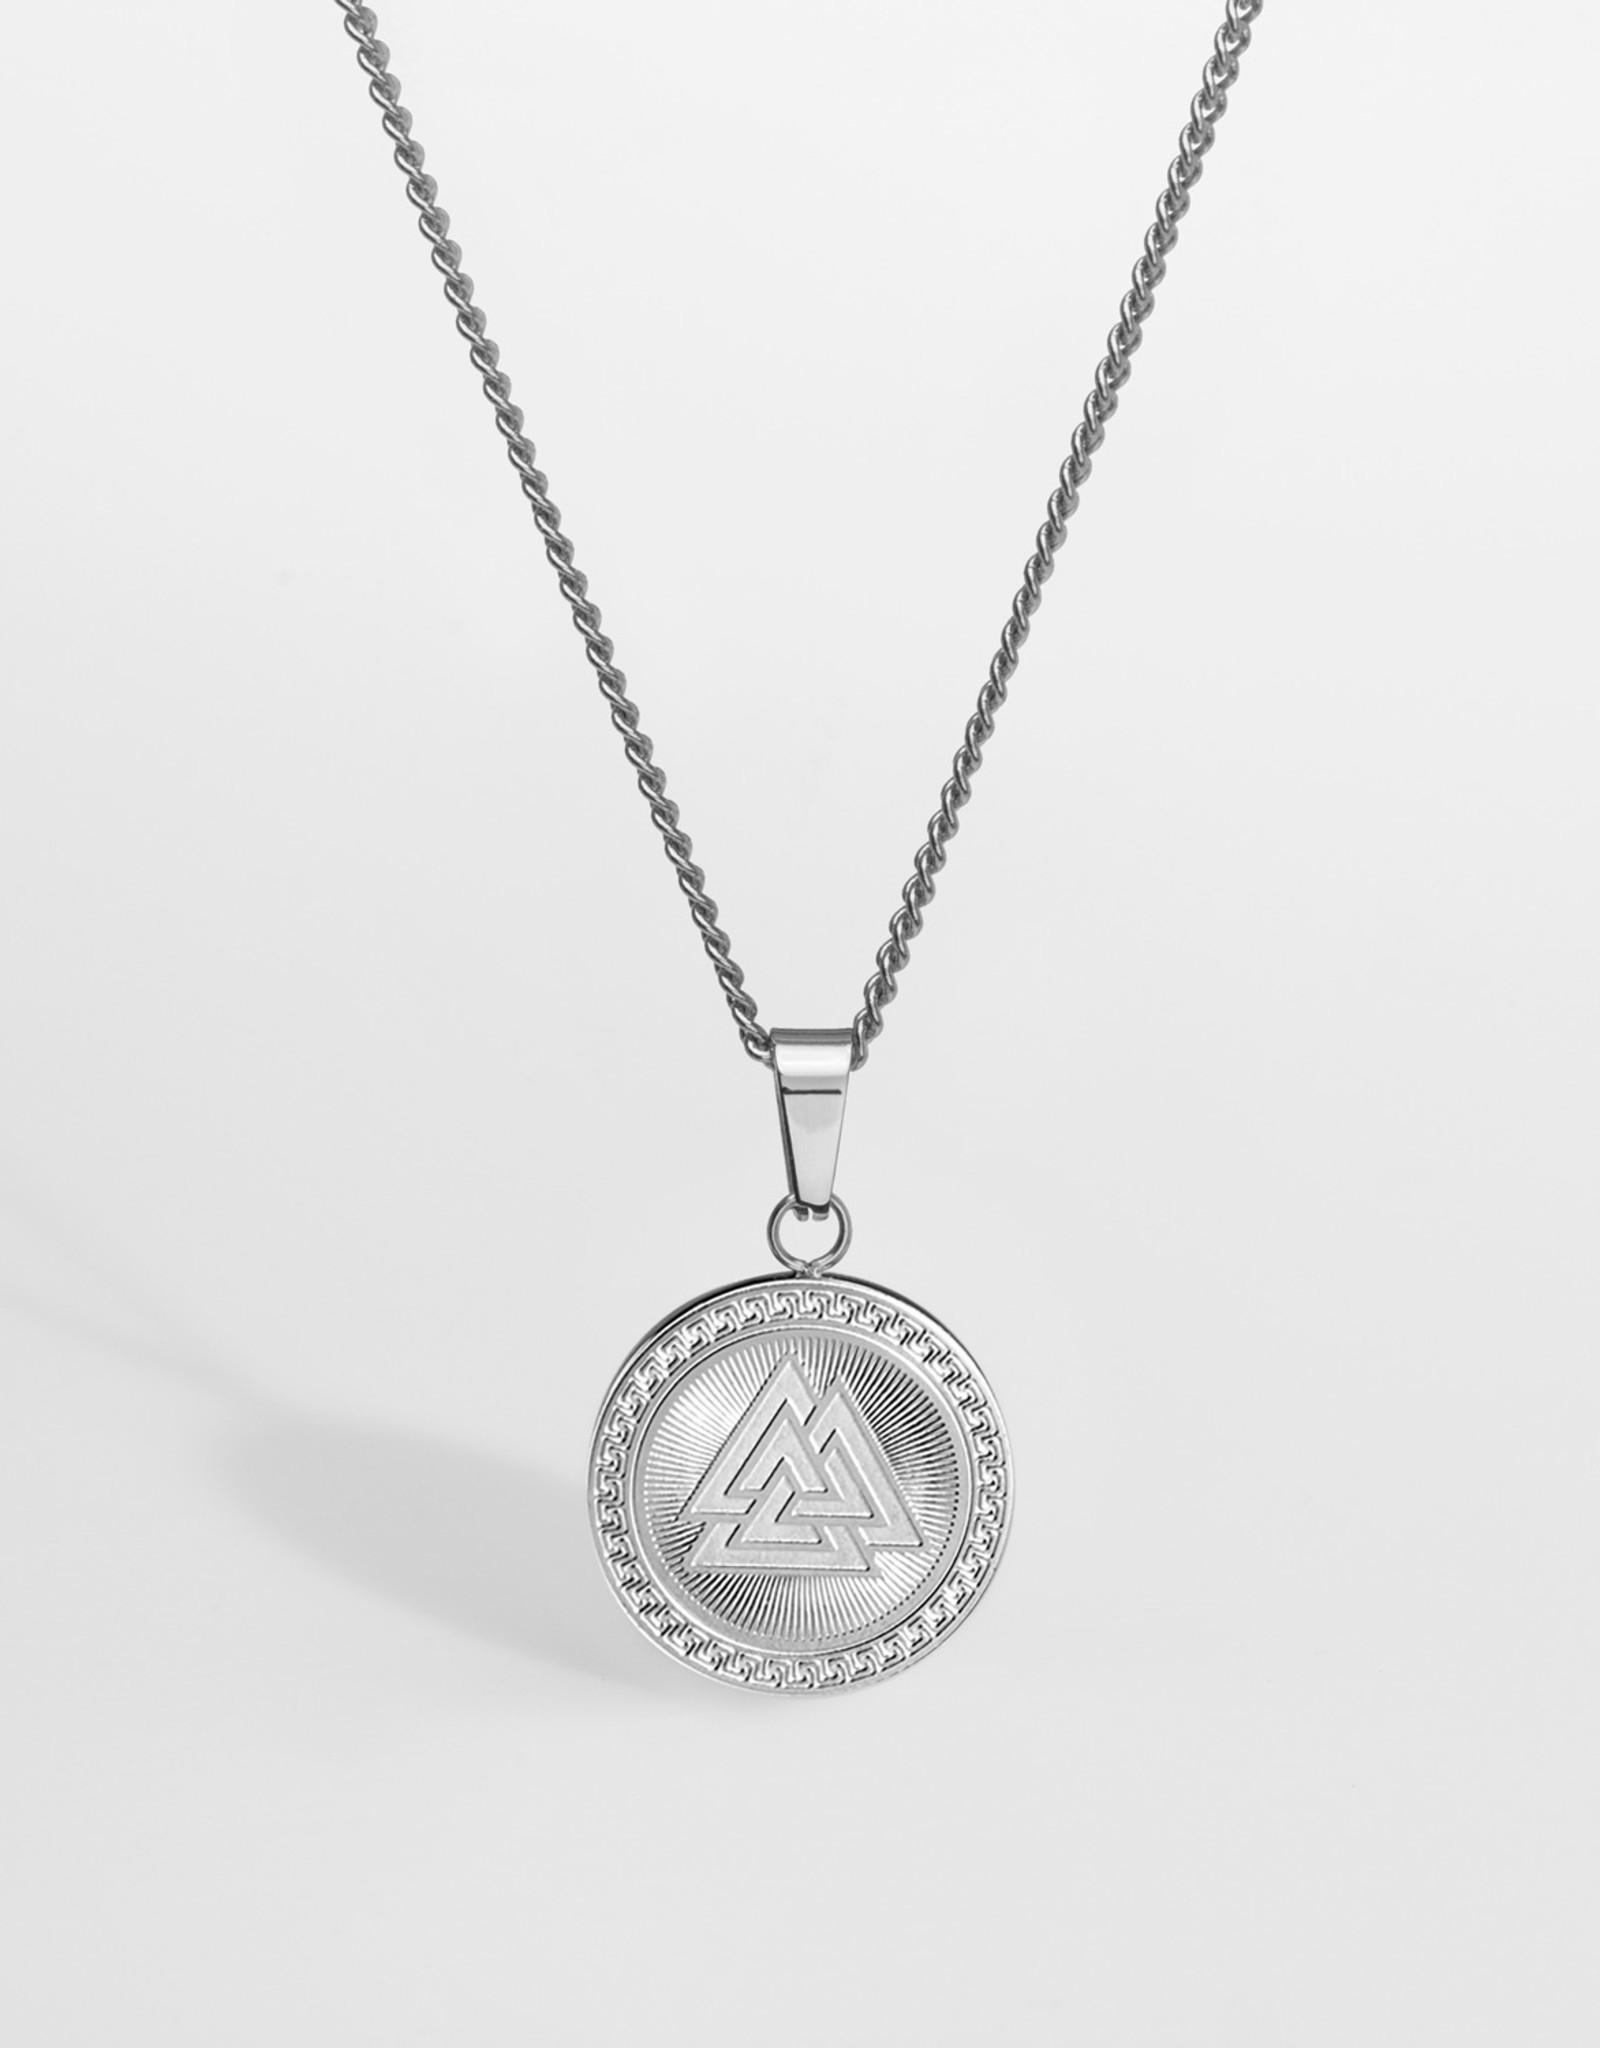 Northern Legacy nl valknut pendant- silver tone